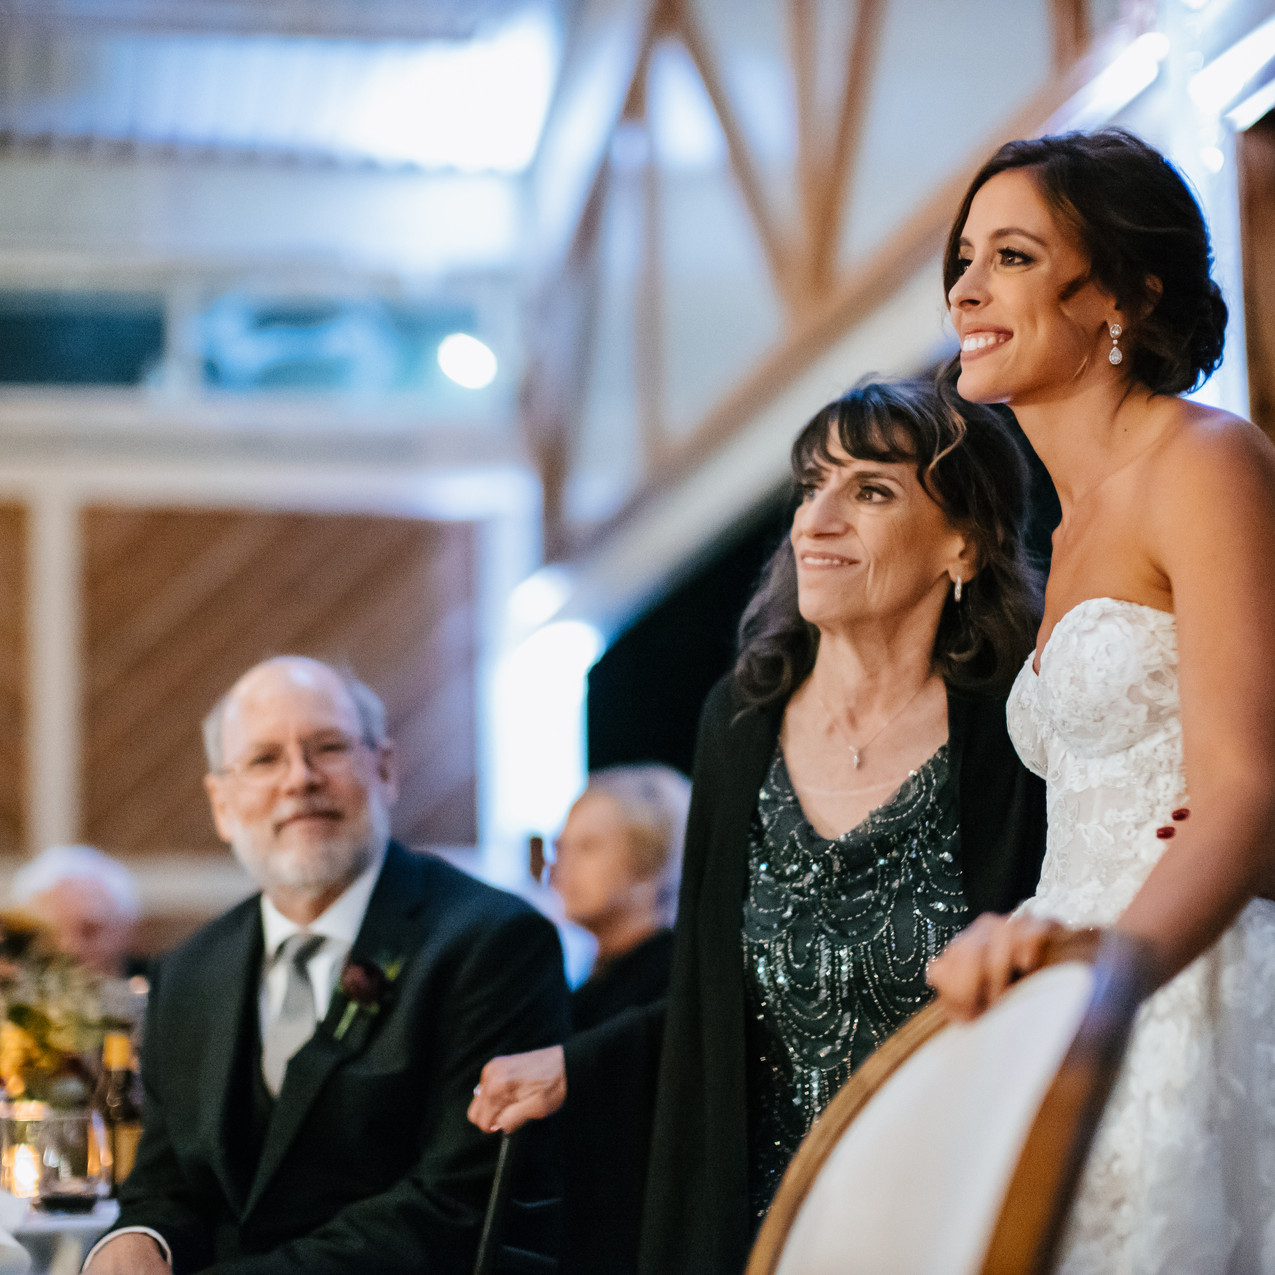 66-Ozer-Gati Wedding-Barr Mansion Jewish